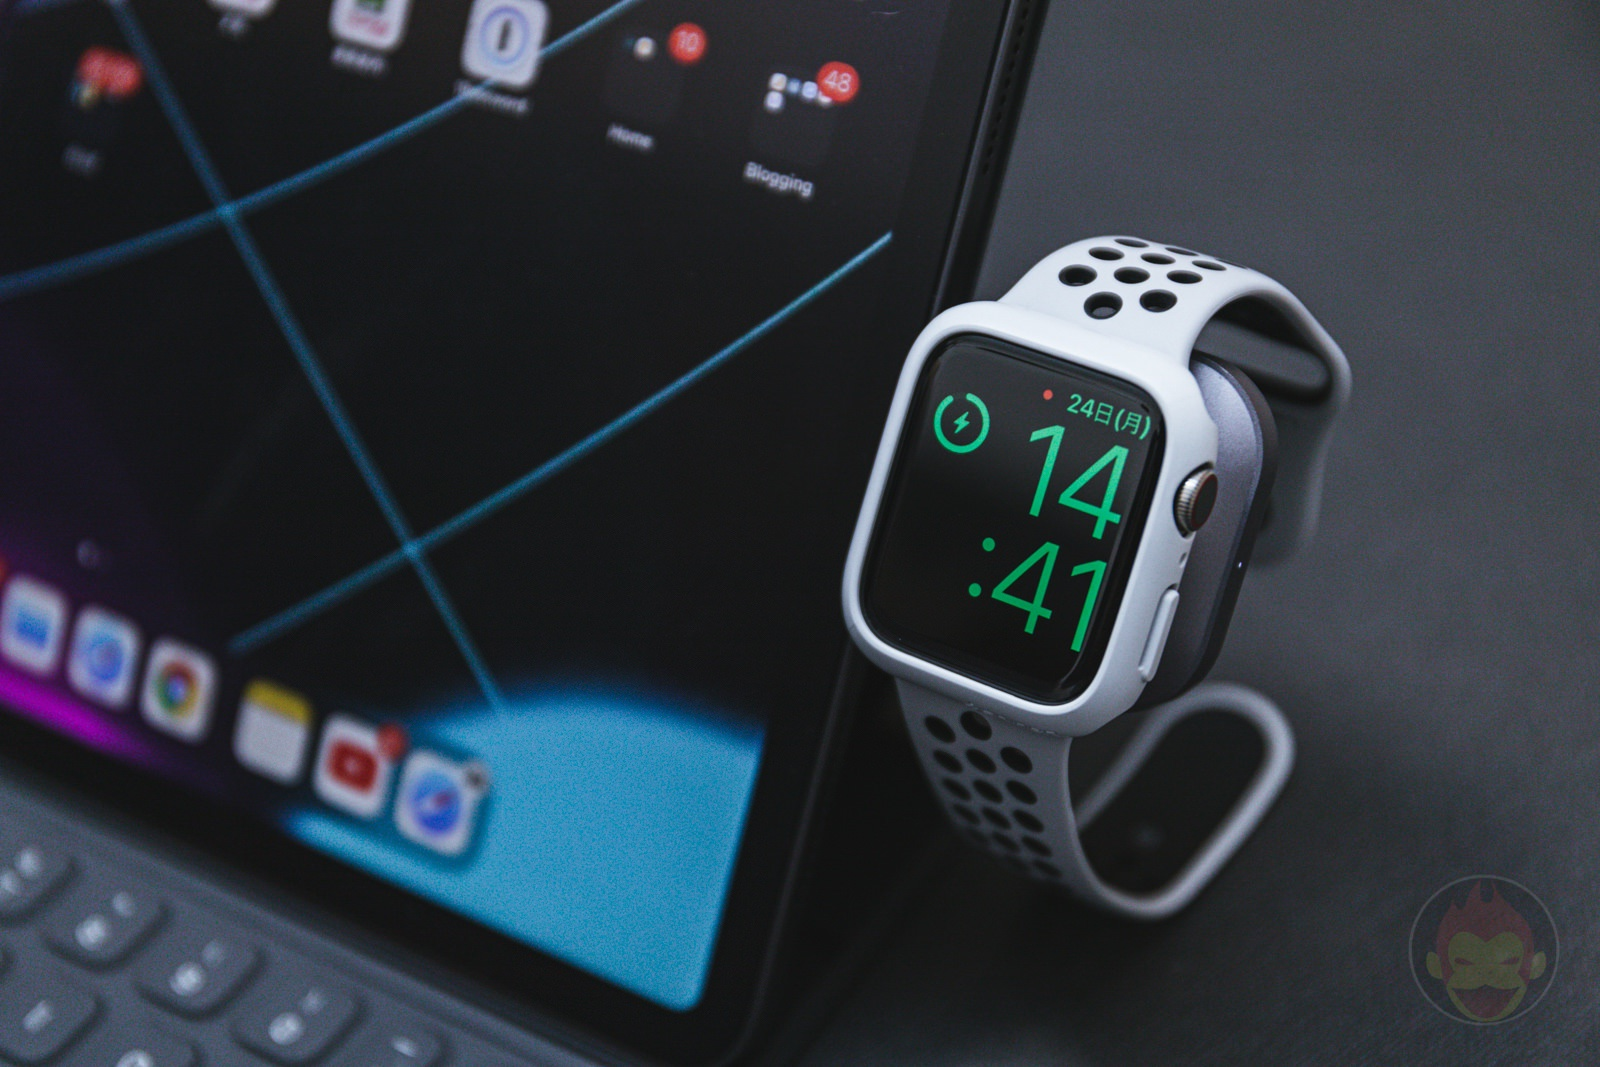 Satechi USB C Apple Watch Charging Dock 14